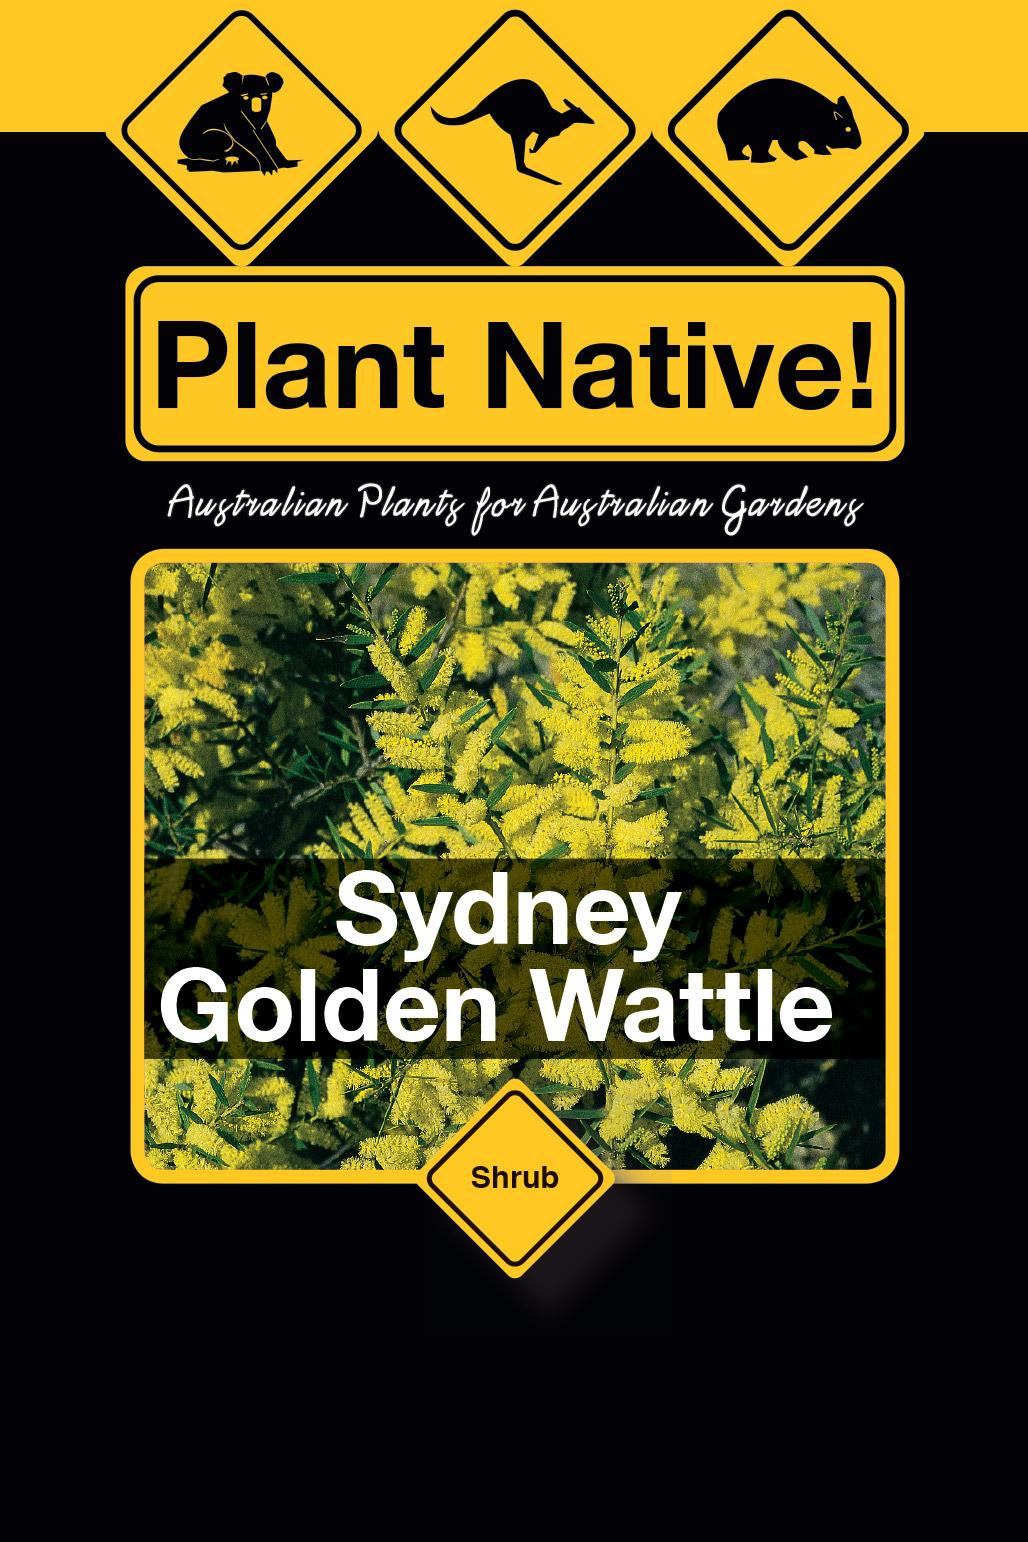 Sydney Golden Wattle - Plant Native!